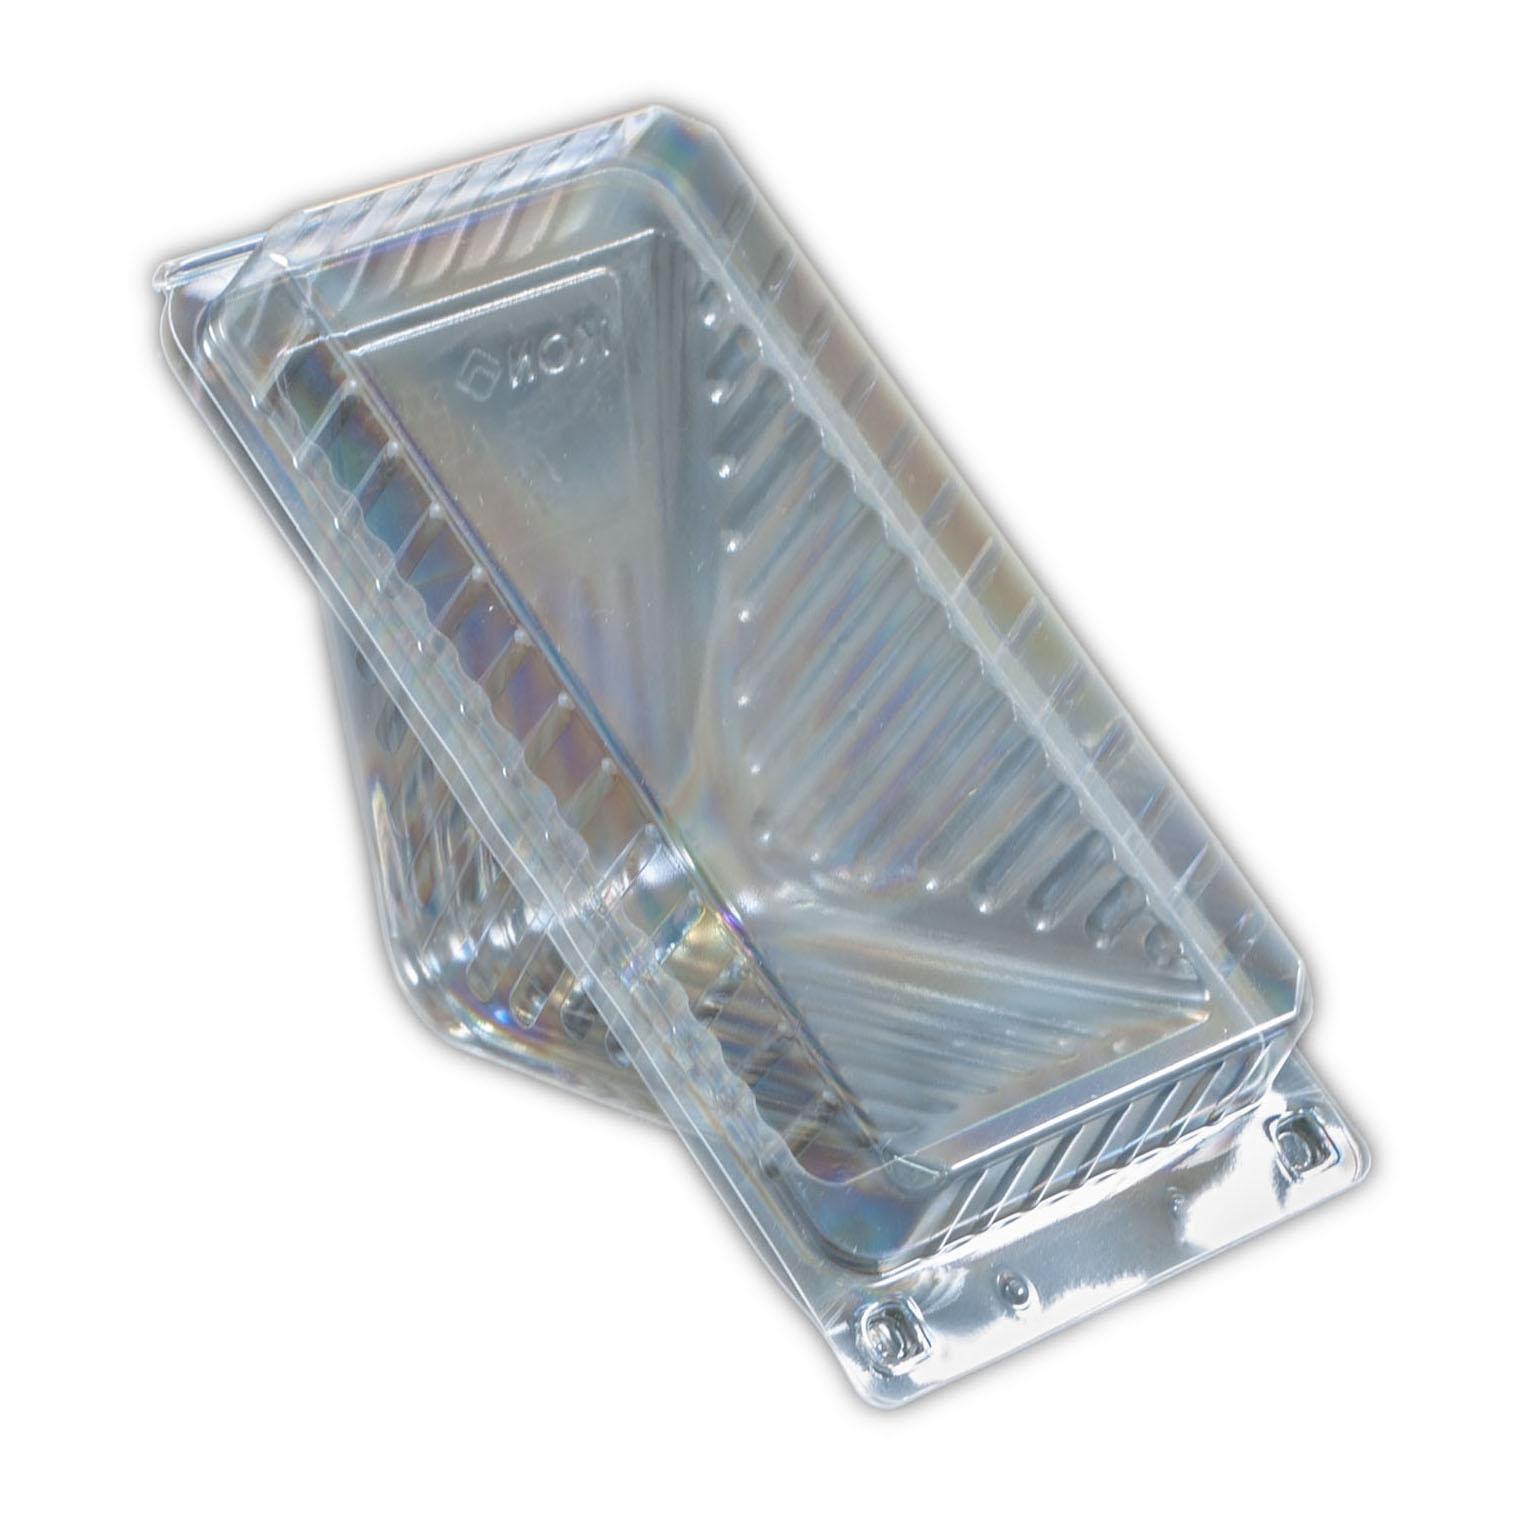 iK-DLX-WEDGE Deluxe Sandwich Wedge   95 x 170 x 75 mm  125 per slv 500 per carton